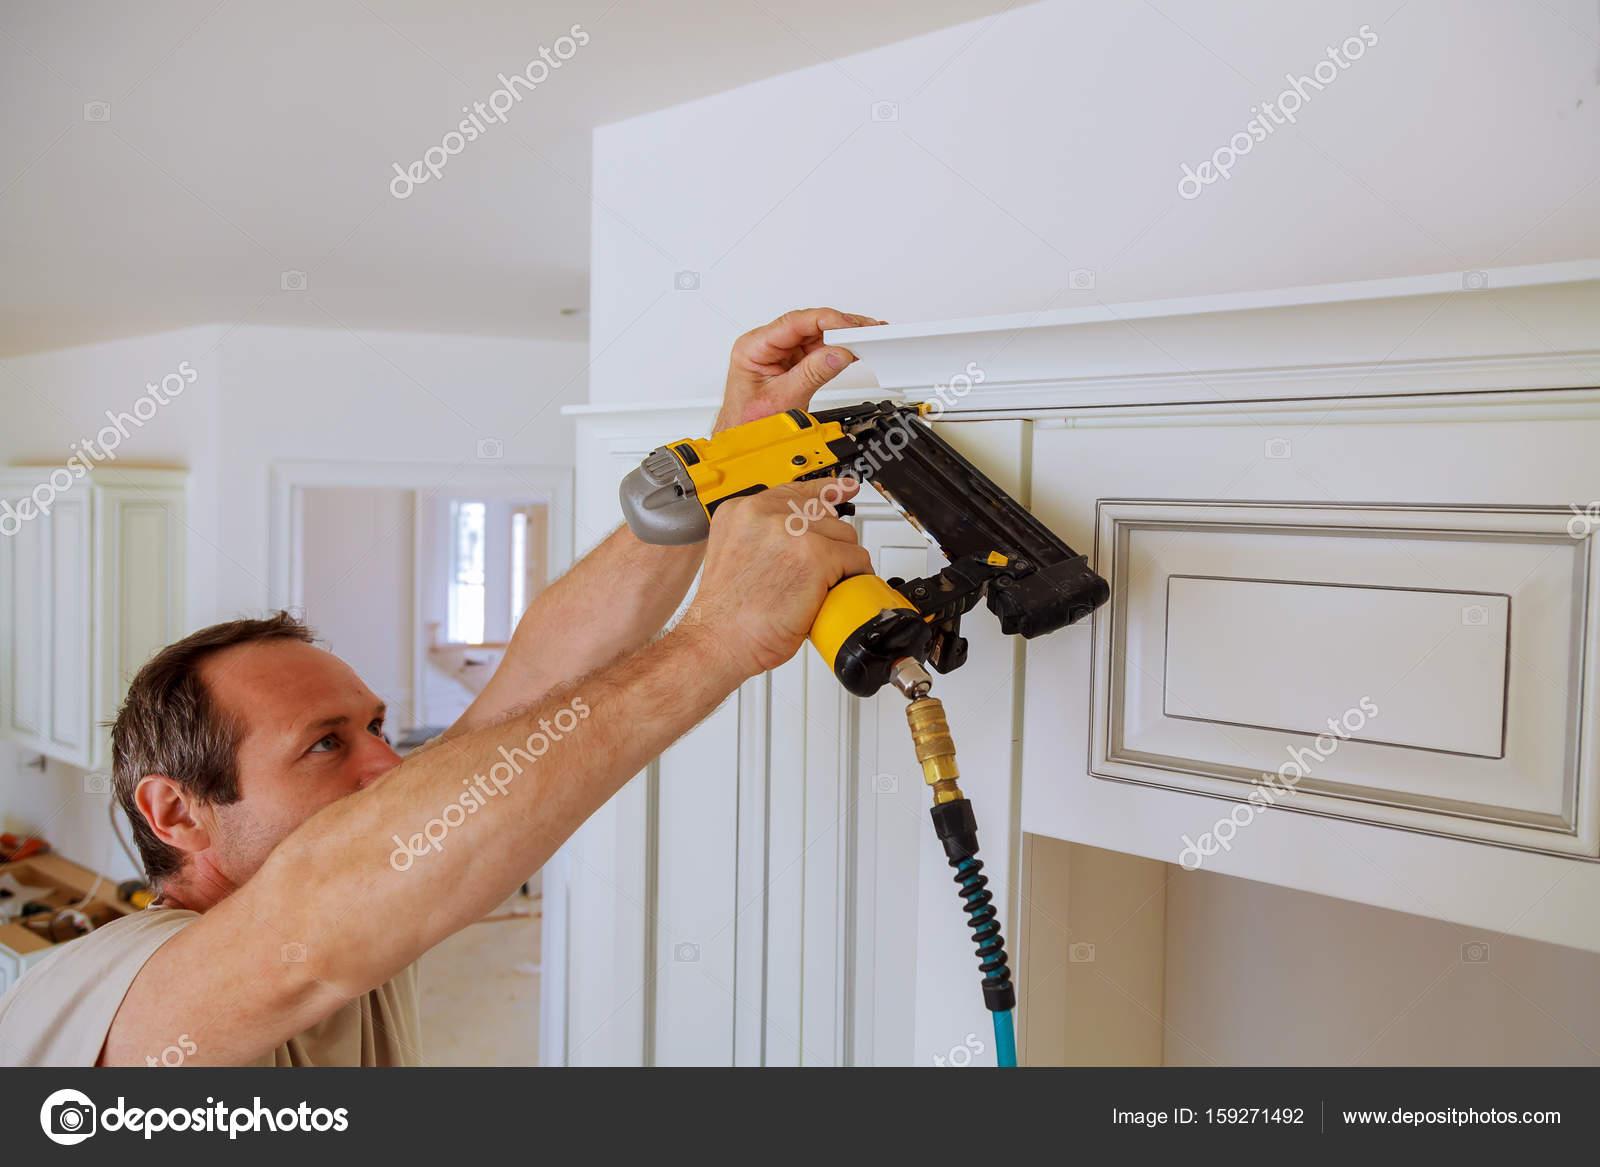 upper kitchen cabinets curio cabinet 木匠使用射钉枪在皇冠造型上厨柜框架修剪的布拉德 图库照片 c photovs 木匠使用射钉枪在皇冠造型上厨柜框架修剪的布拉